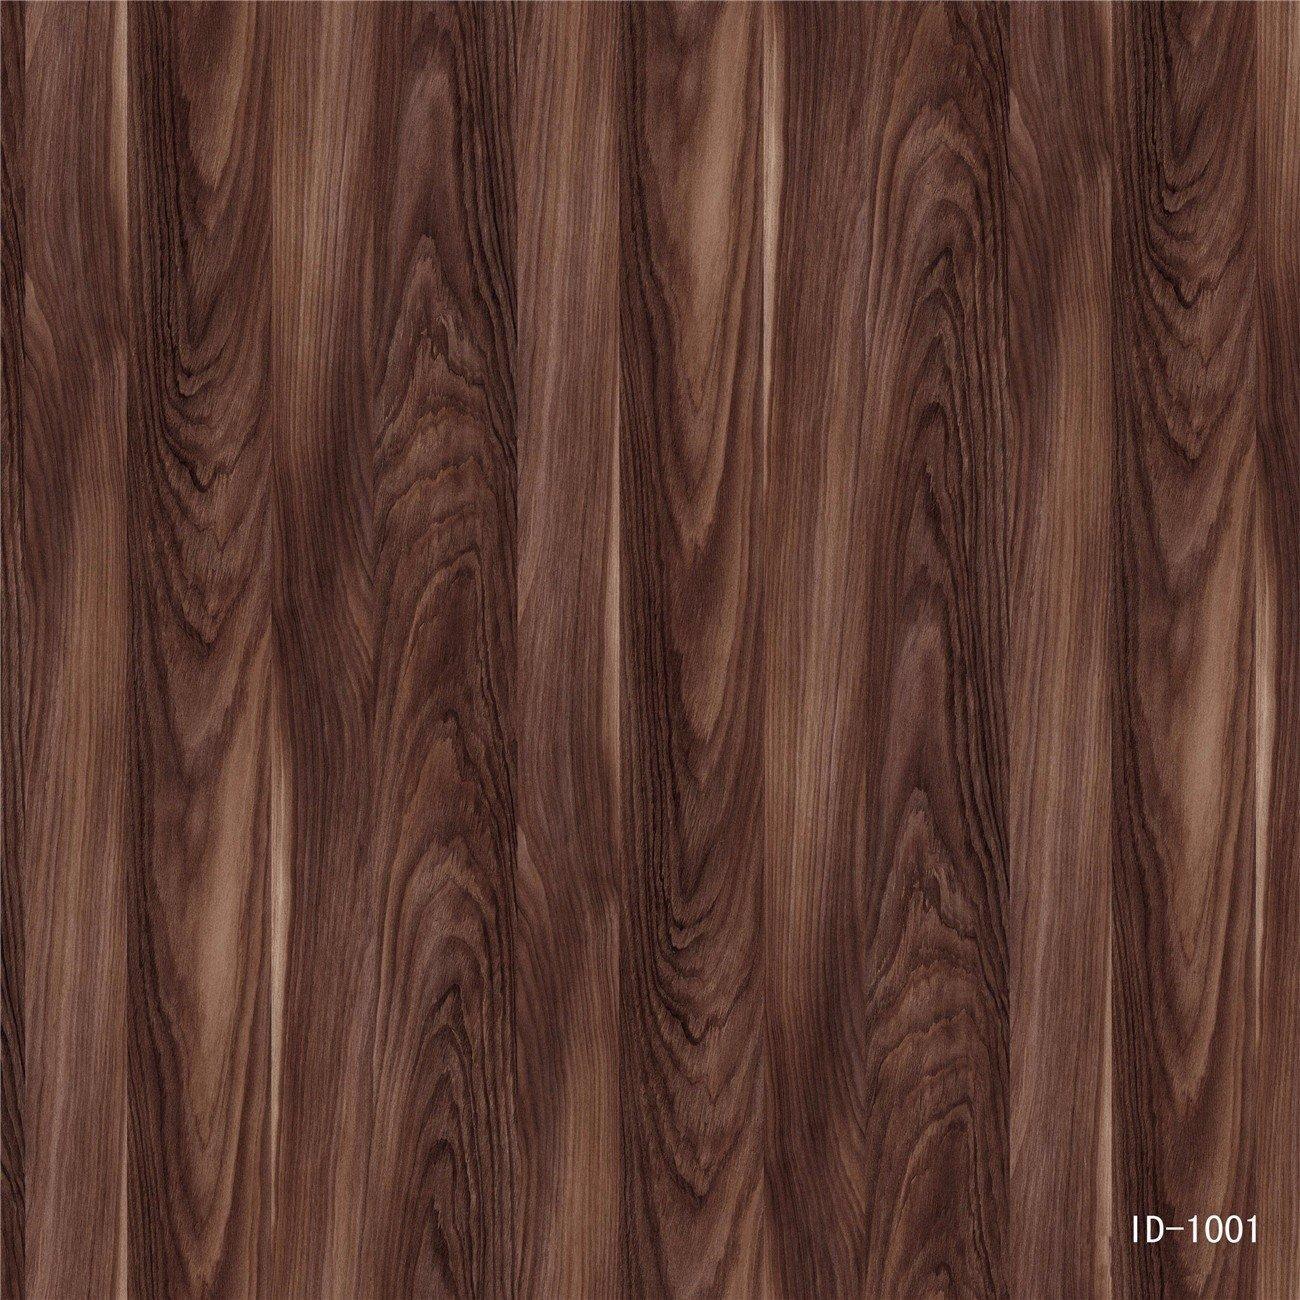 home decor id1001 I.DECOR Decorative Material Brand walnut melamine